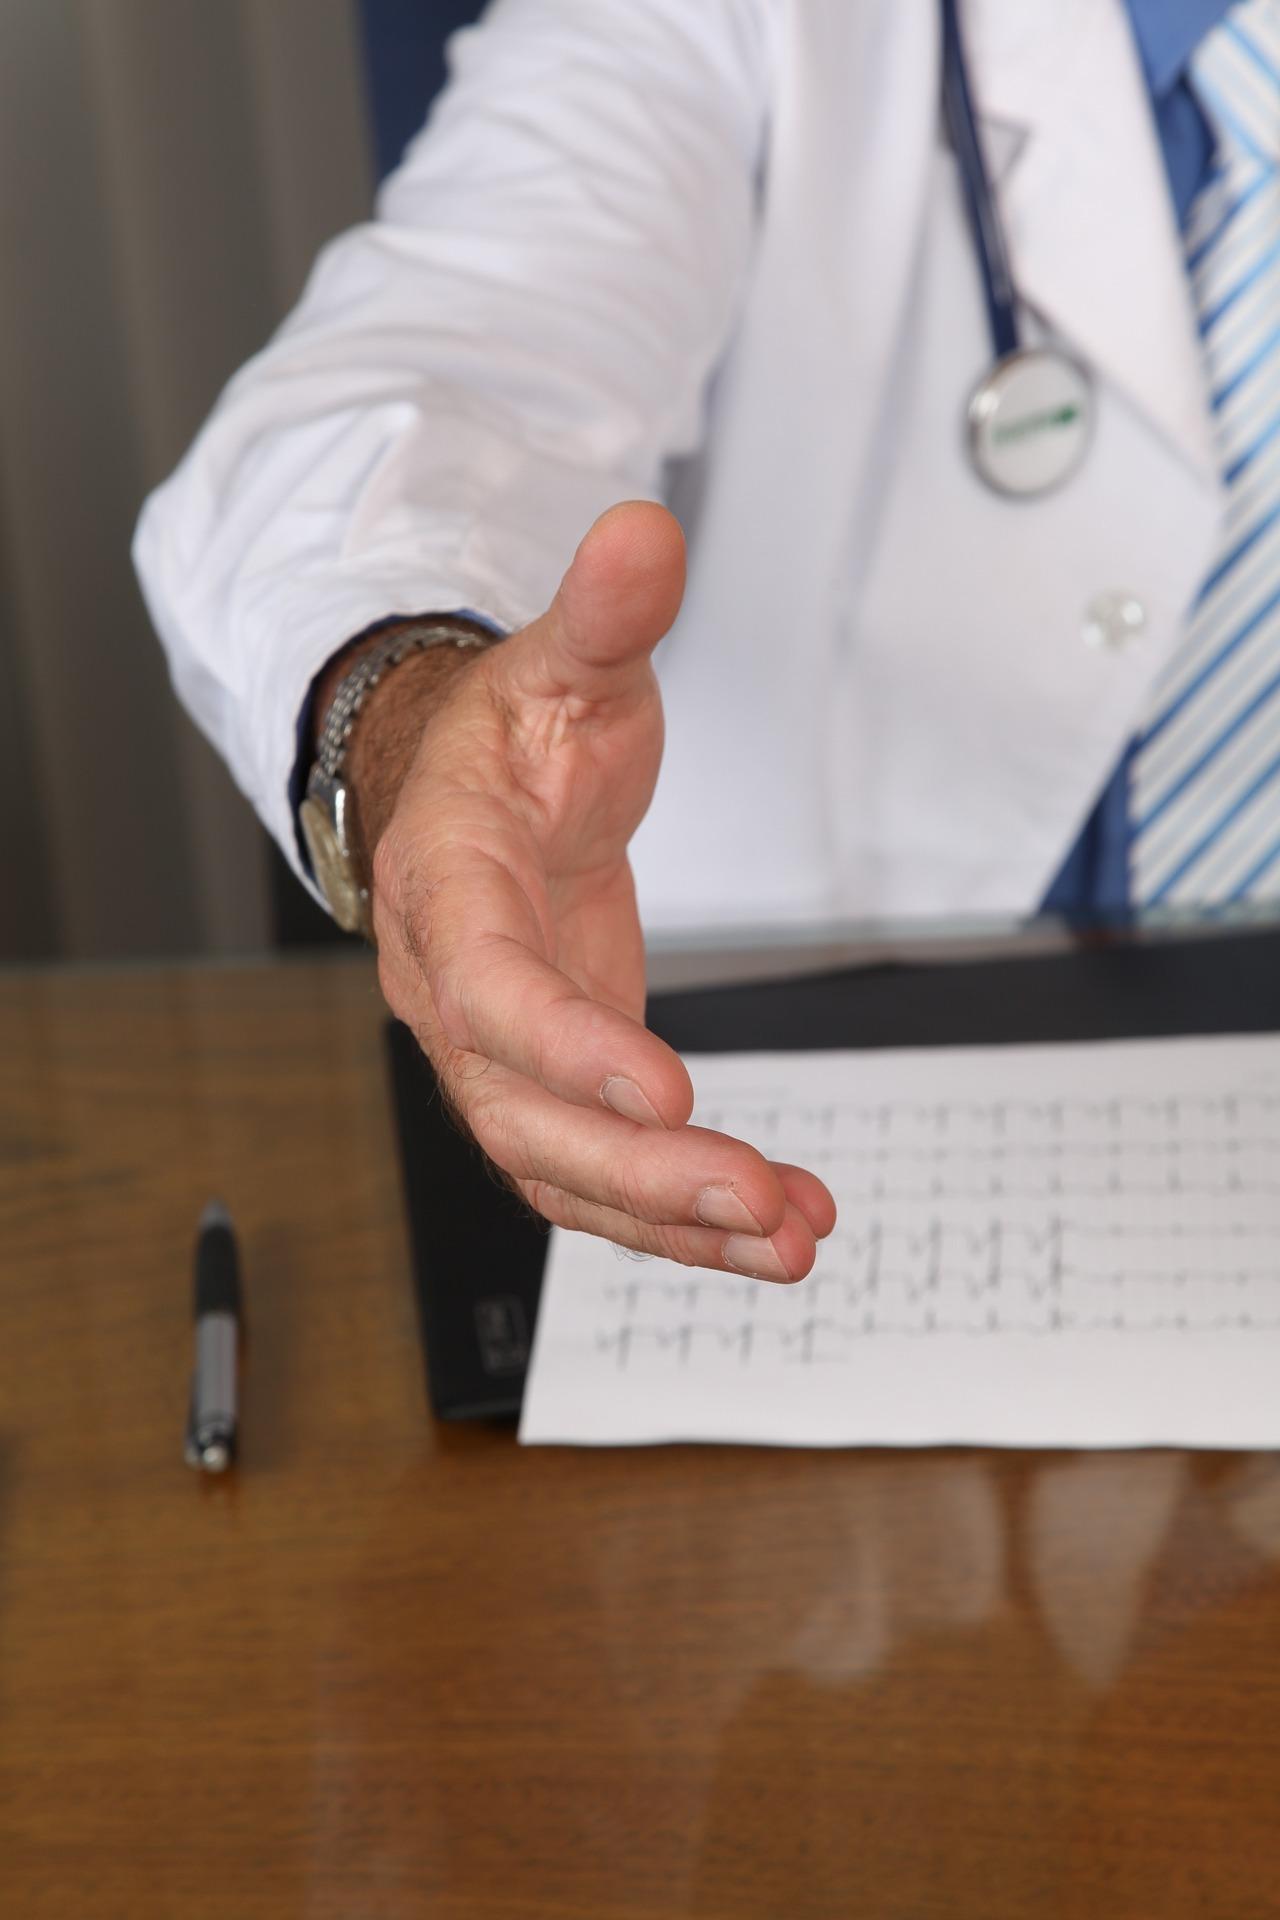 comunicarea-medic-pacient-elemente-care-eficientizeaza-procesul-comunicarii